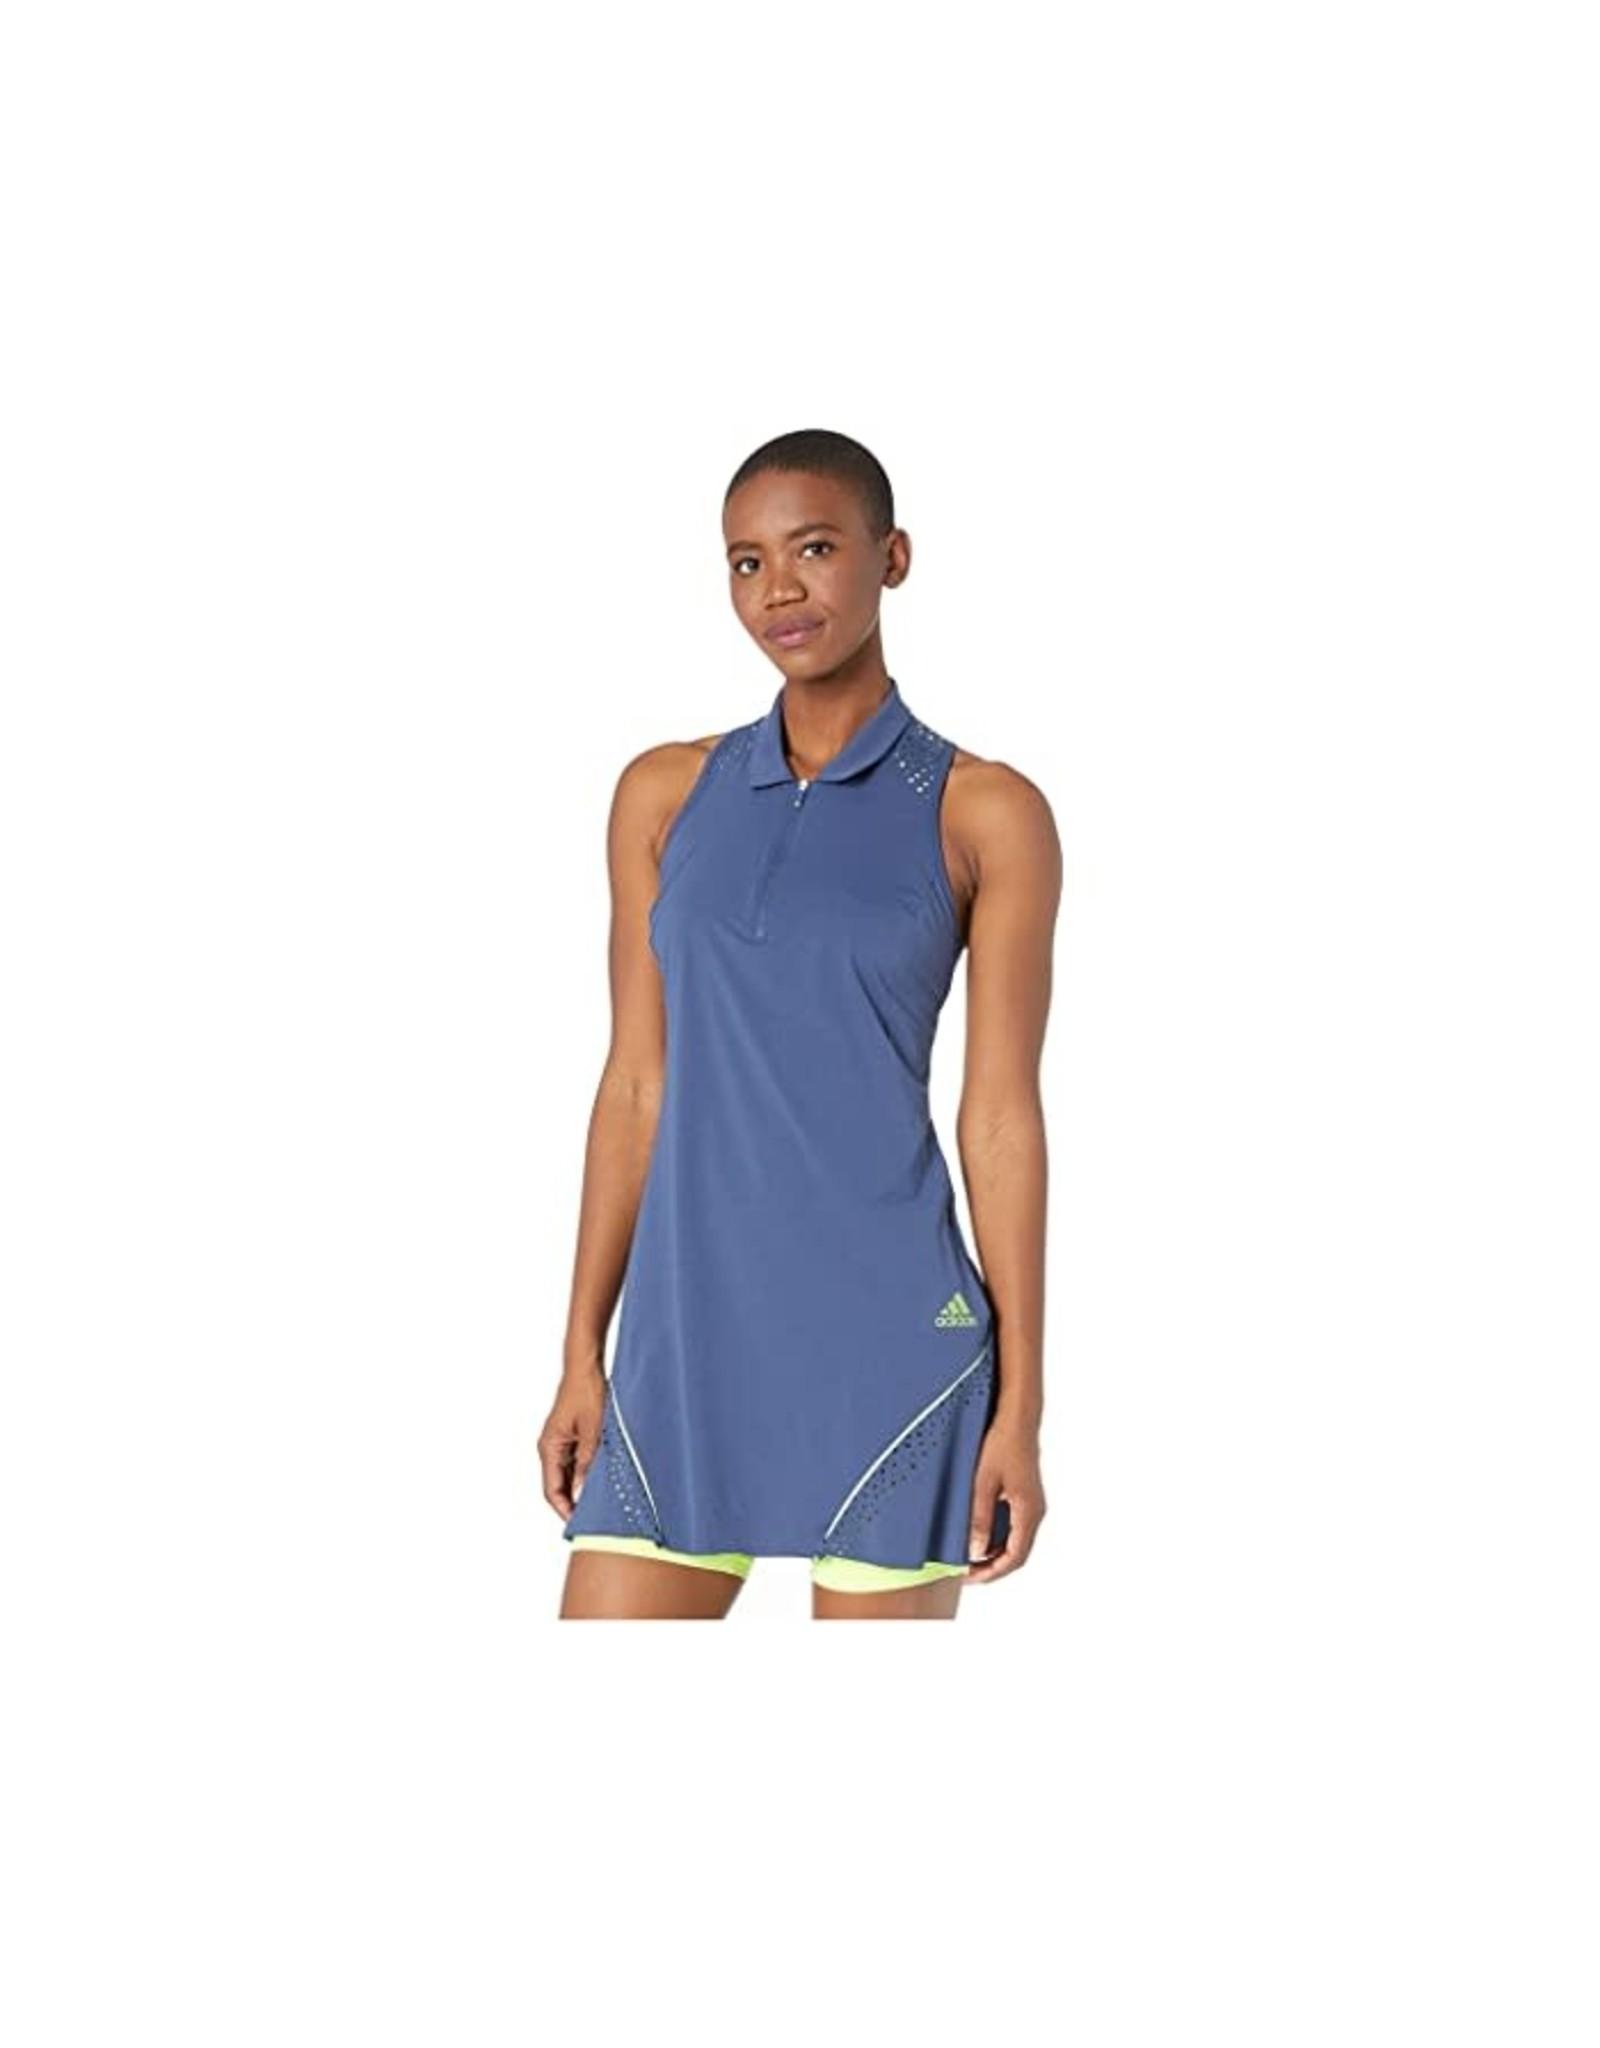 Adidas Adi Dress CLR PREF